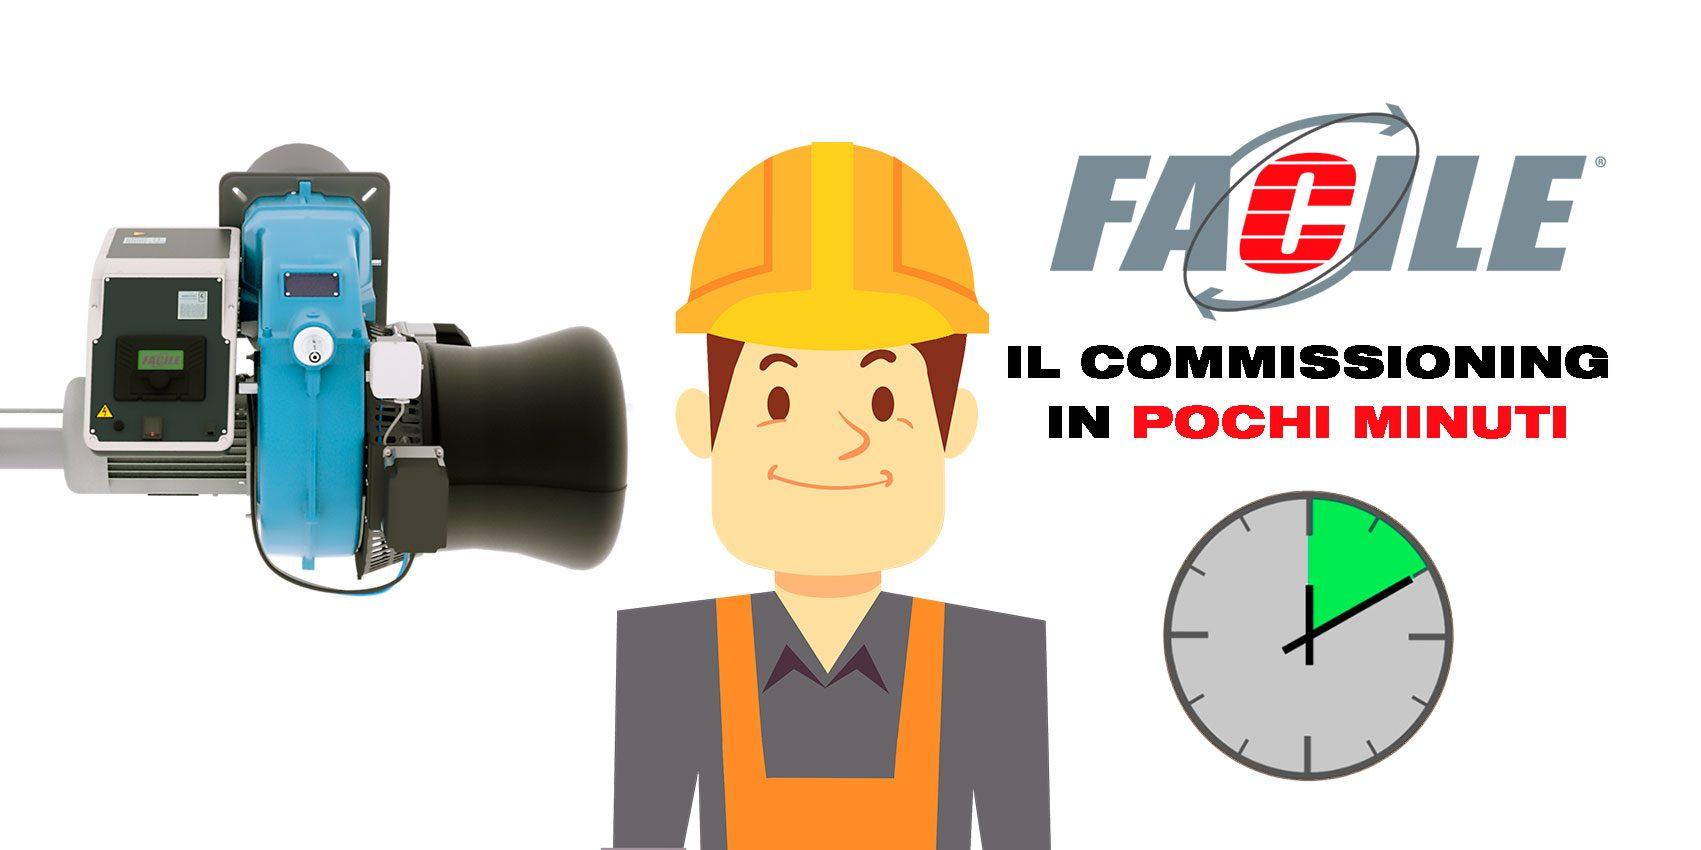 Bruciatore-FACILE-CIB-Unigas-commissioning-in-pochi-minuti